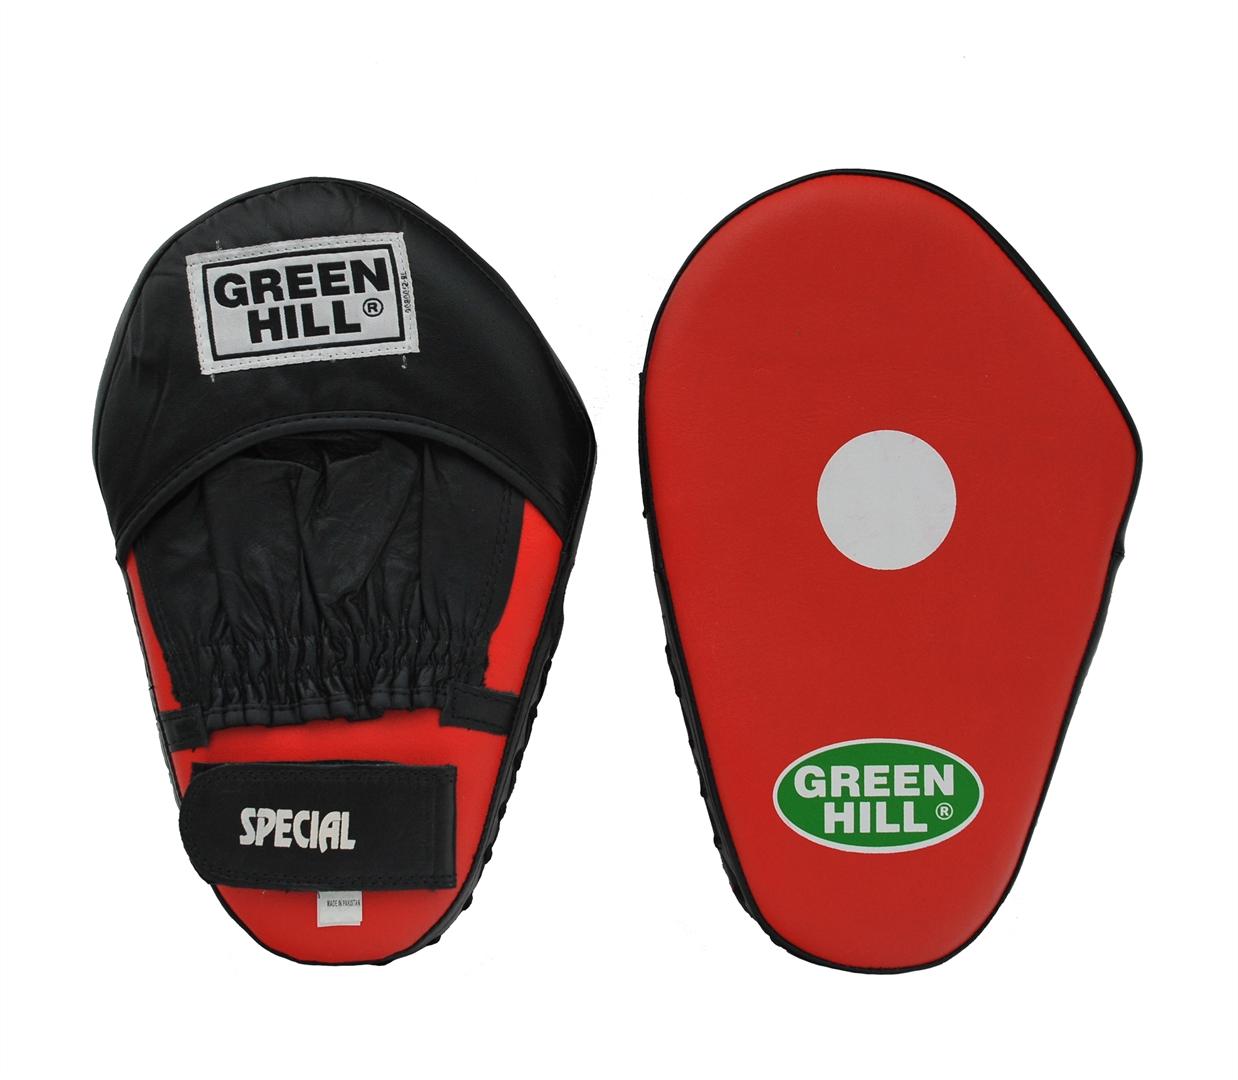 Лапы боксерские Green Hill Special, большие, 2 шт лапы everlast боксерские лапы vinyl mantis